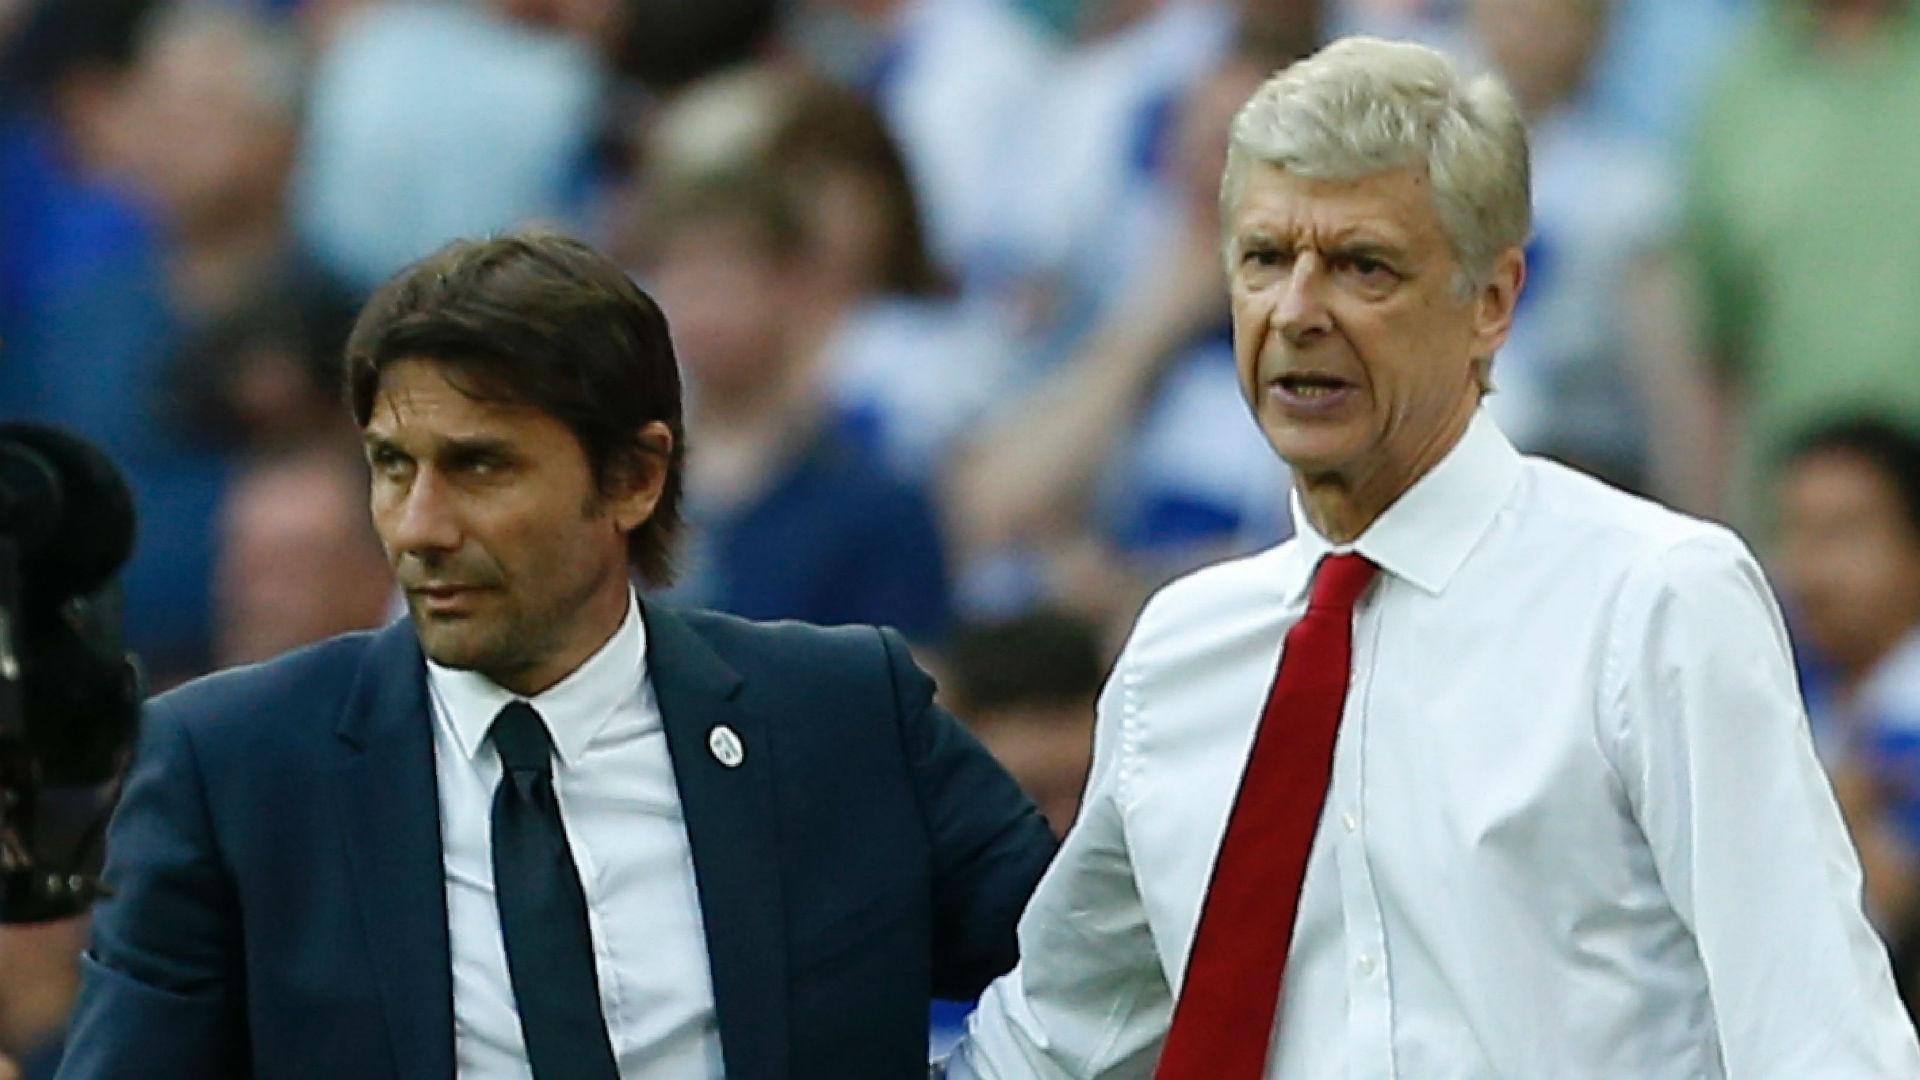 Antonio Conte Chelsea Arsene Wenger Arsenal